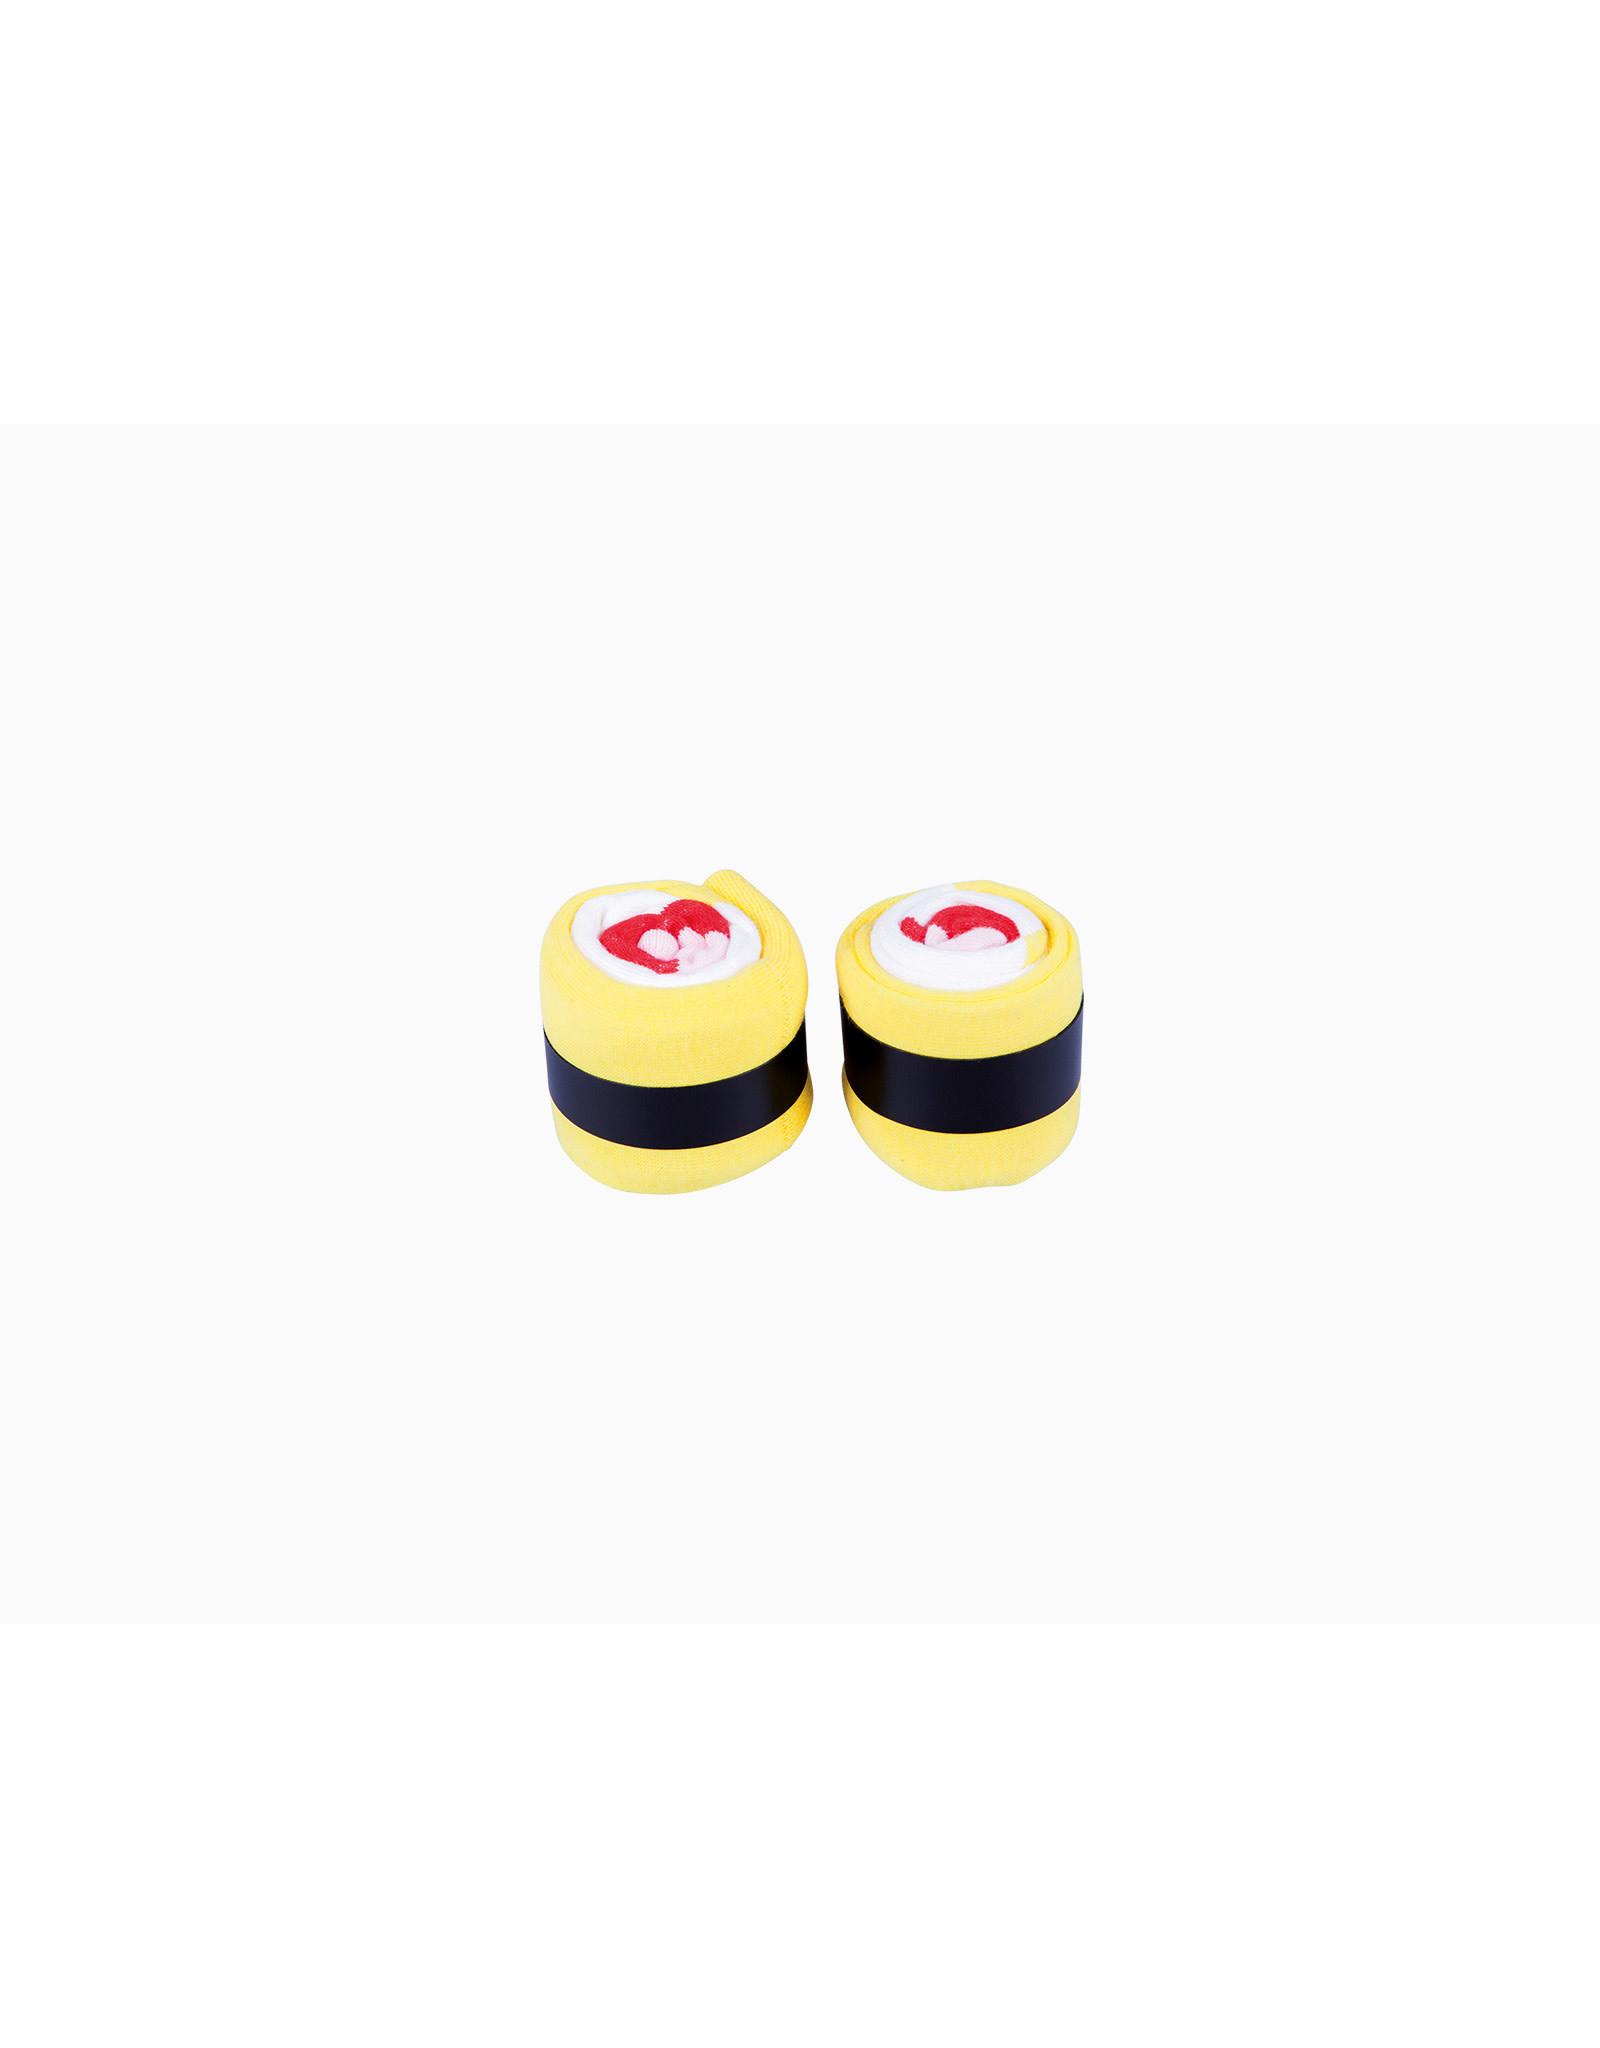 DOY - Omelette Maki Sushi  Socks